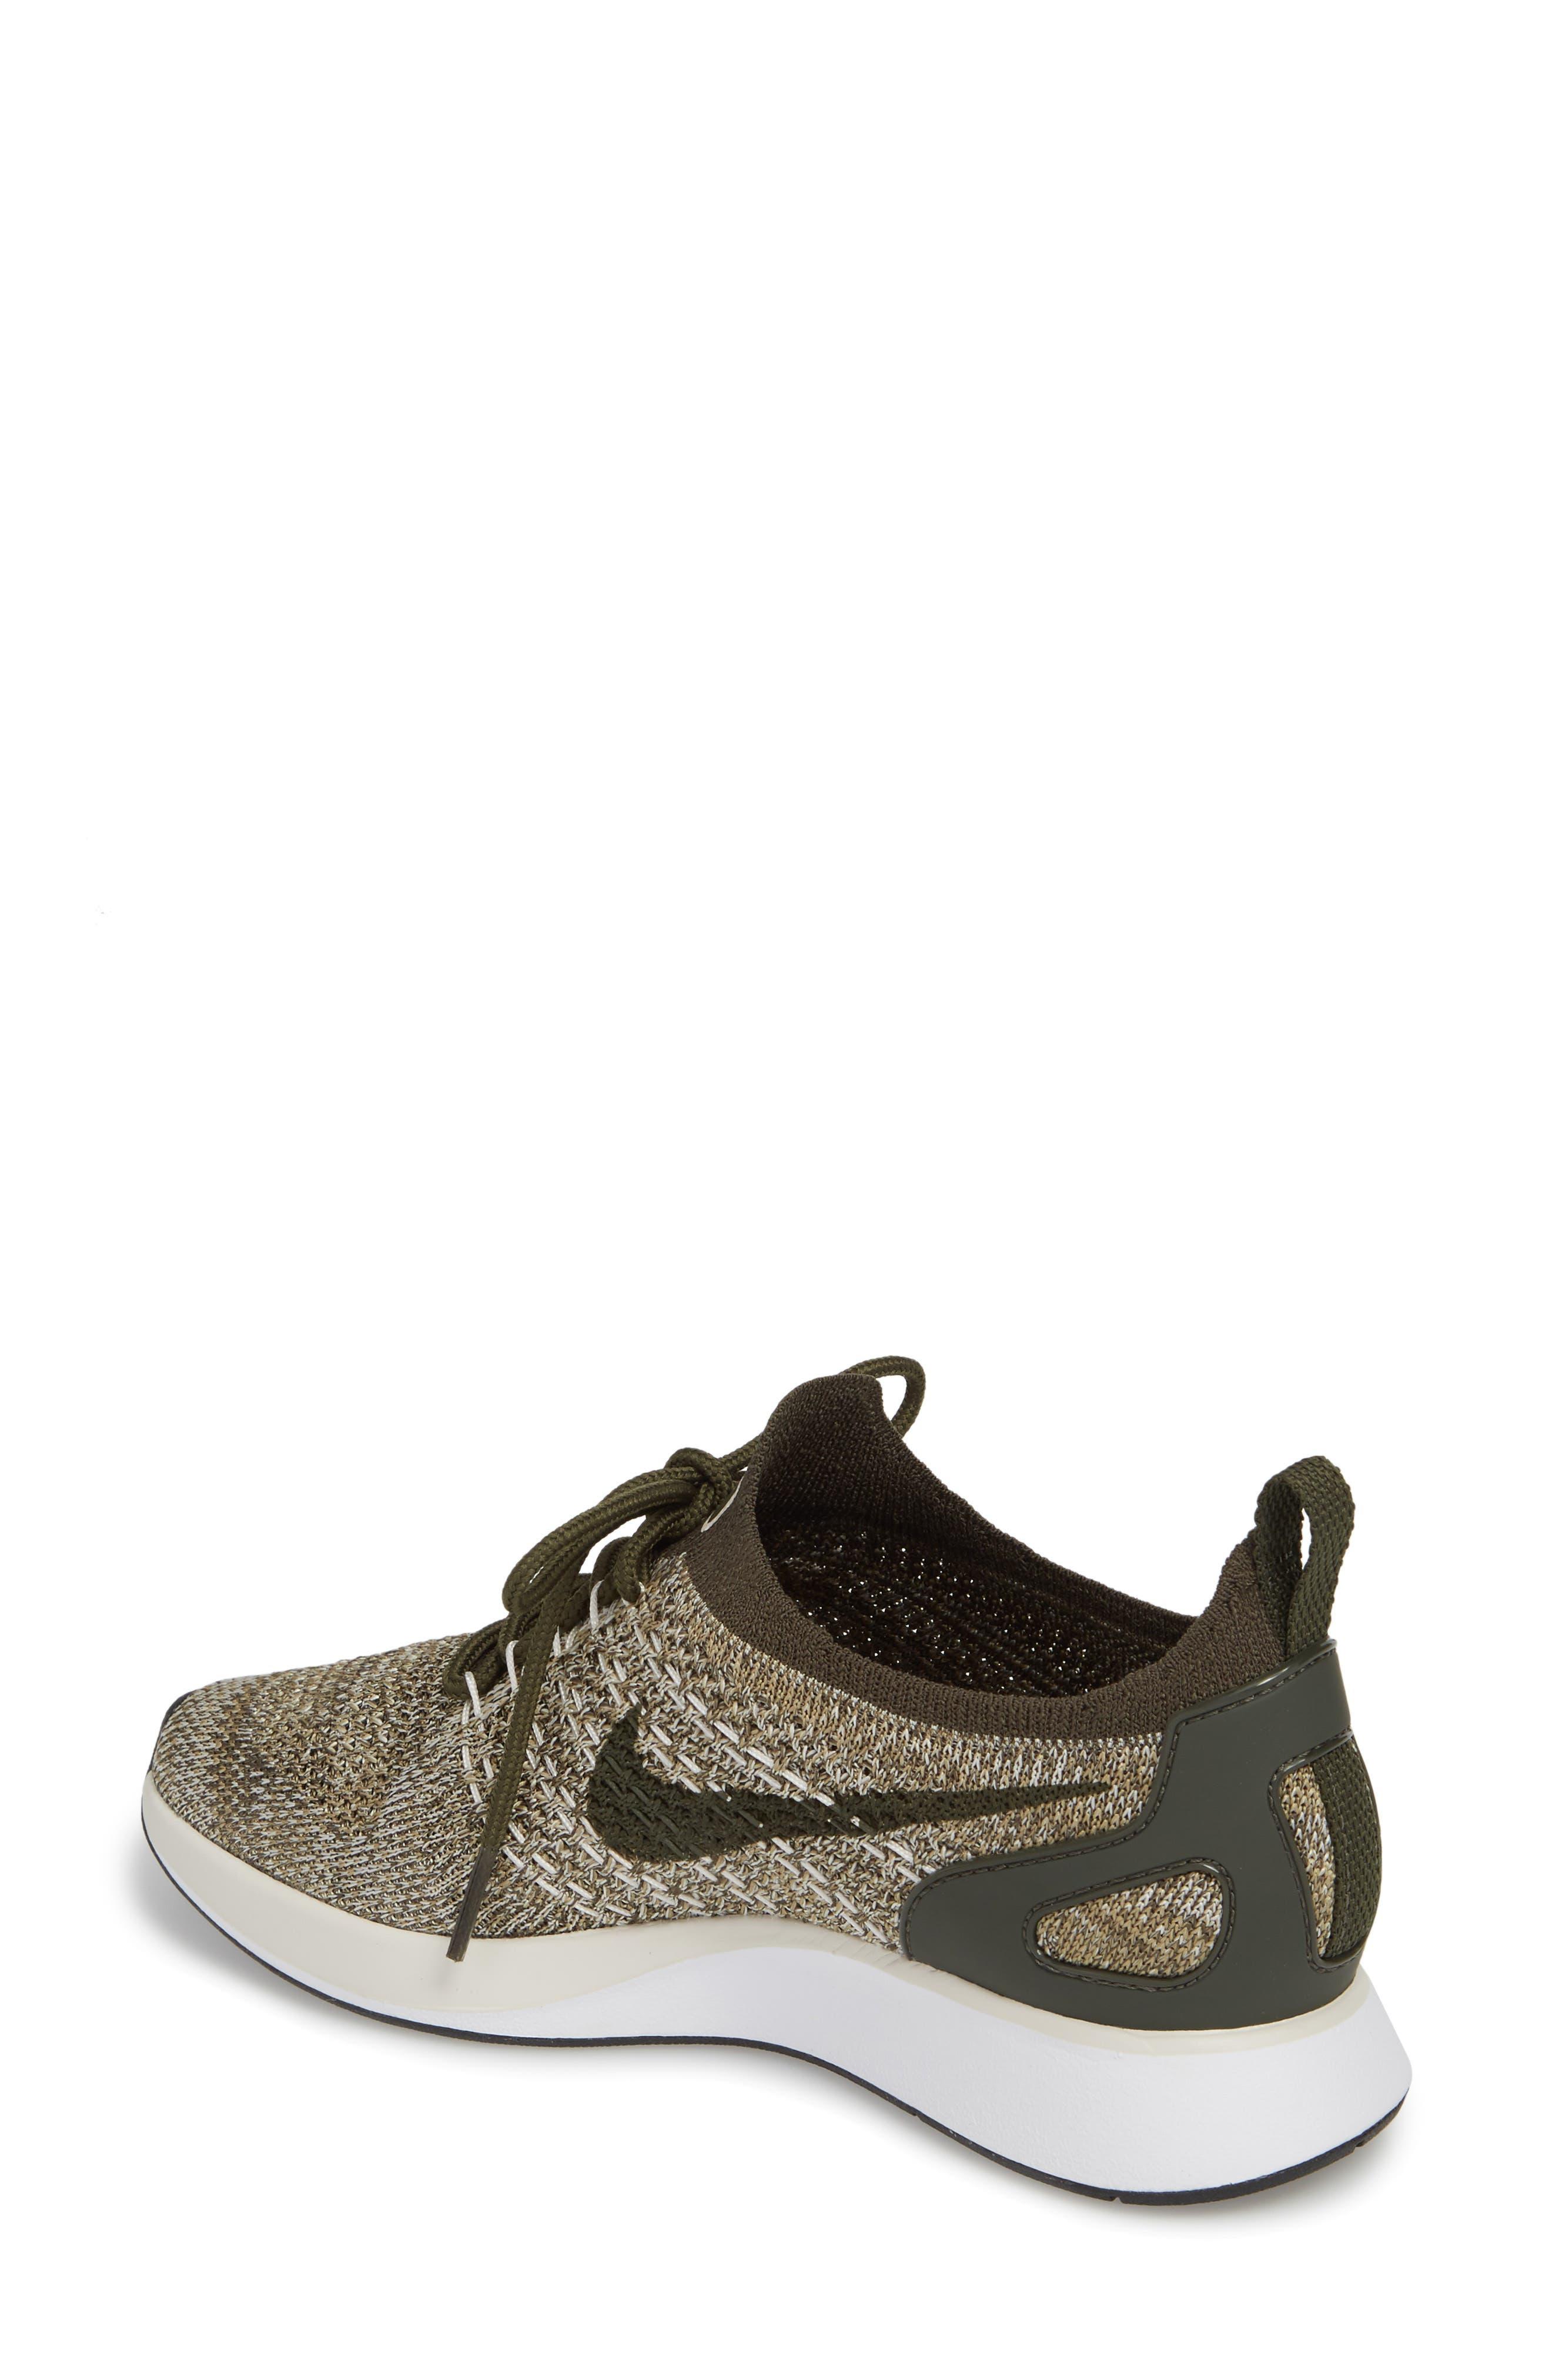 Air Zoom Mariah Flyknit Racer Sneaker,                             Alternate thumbnail 2, color,                             Cargo Khaki/ Cargo Khaki